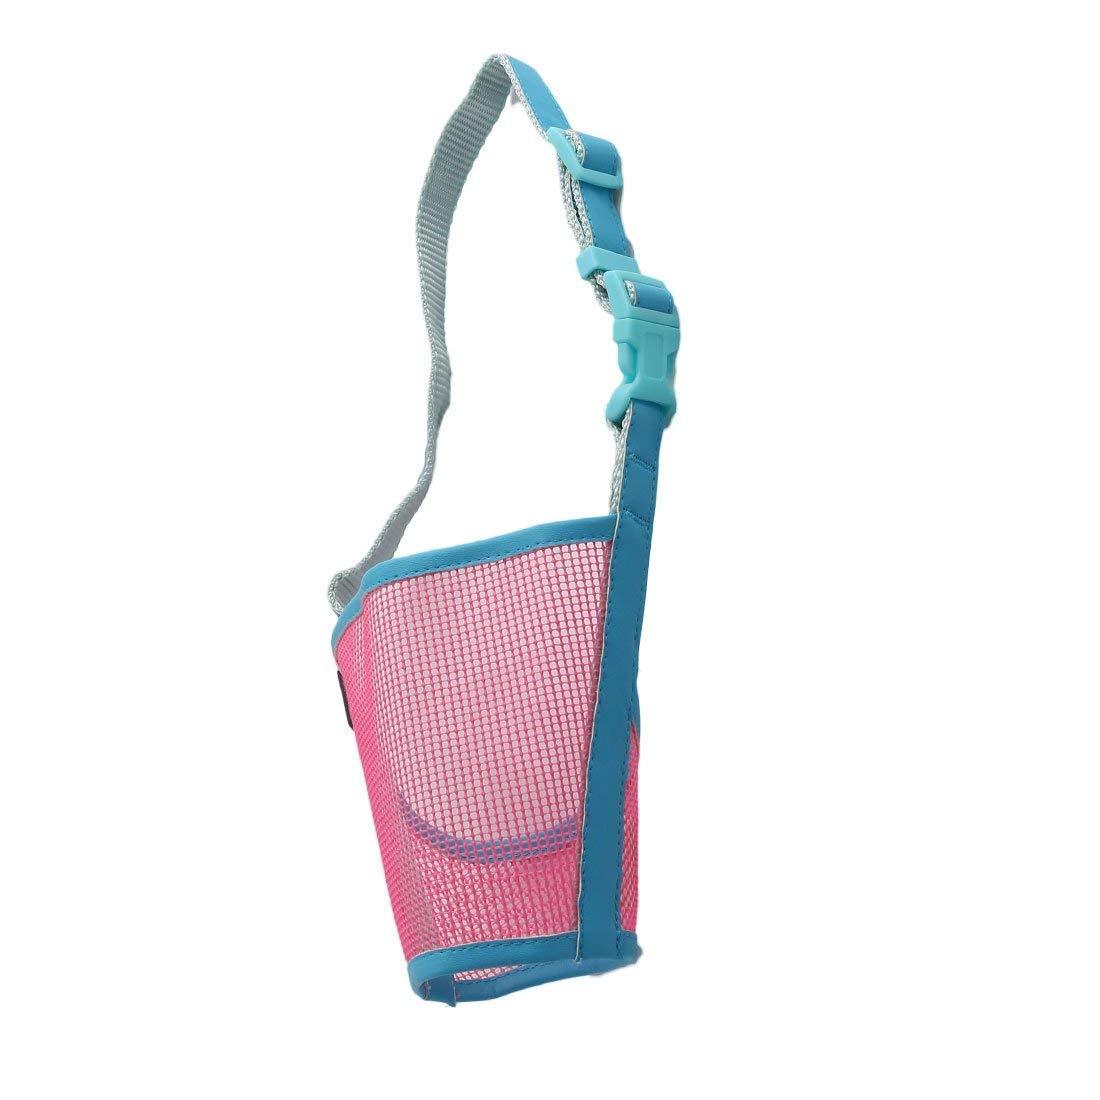 1Pc Plastic Dog Puppy Adjustable Strap Anti Bite Mouth Mask Muzzle Guard Size XXL Pink bluee